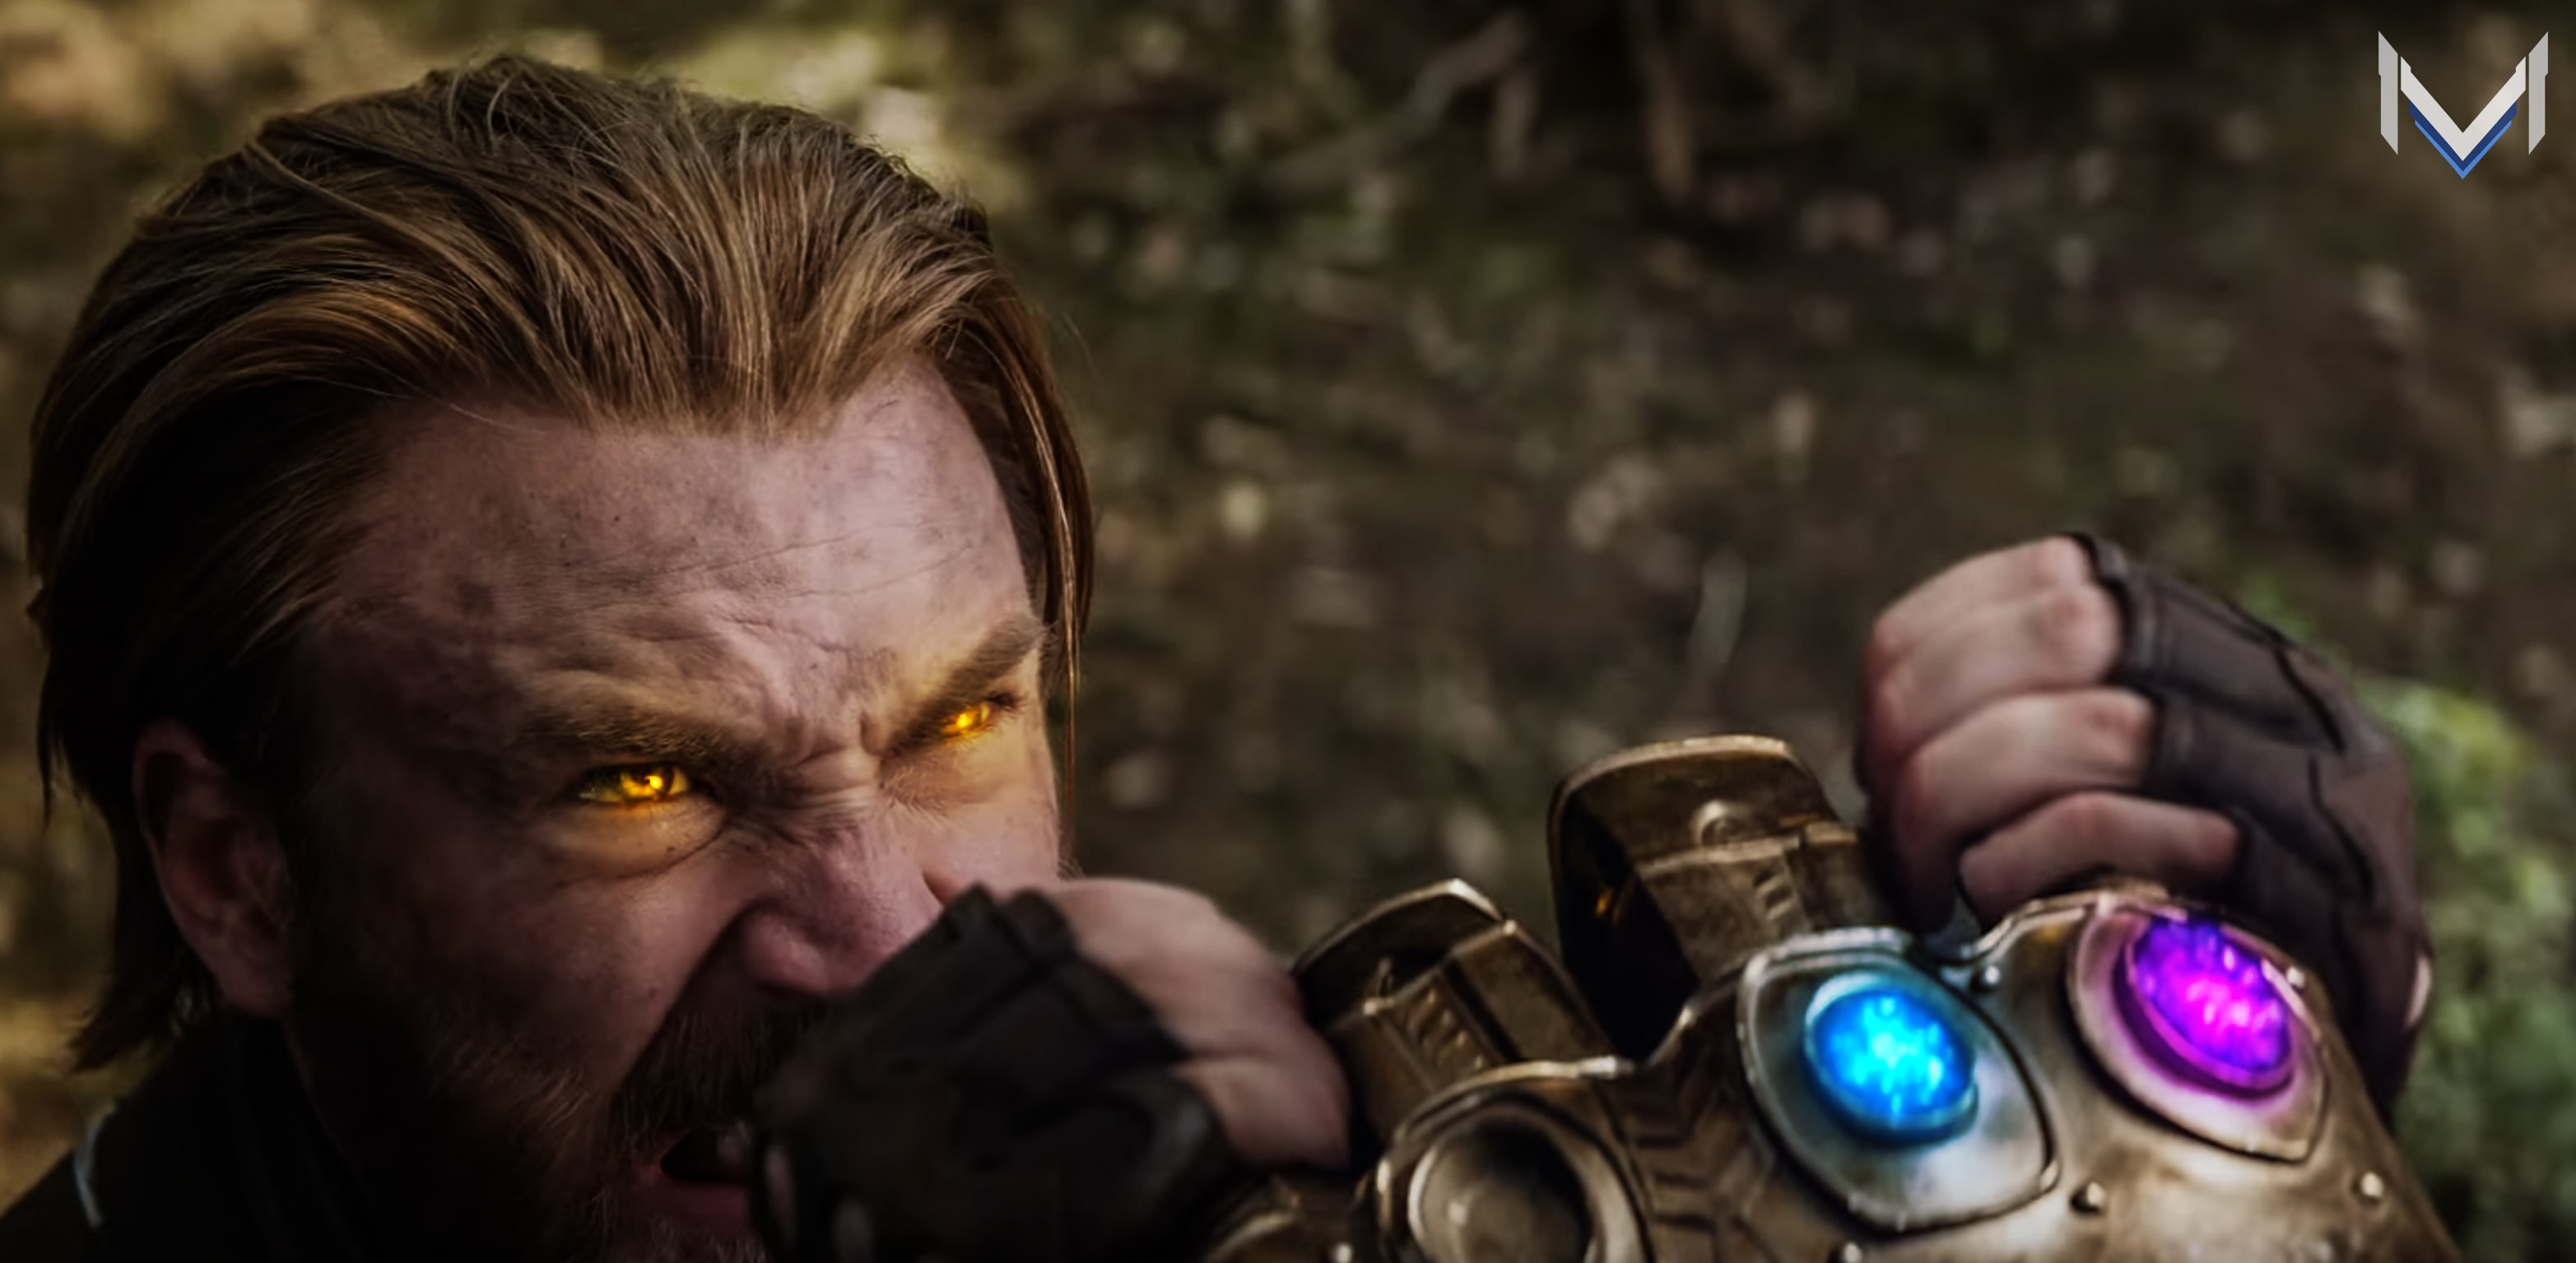 Captain America Thanos Avengers Infinity War 2018 3752 Wallpapers 3130x1535